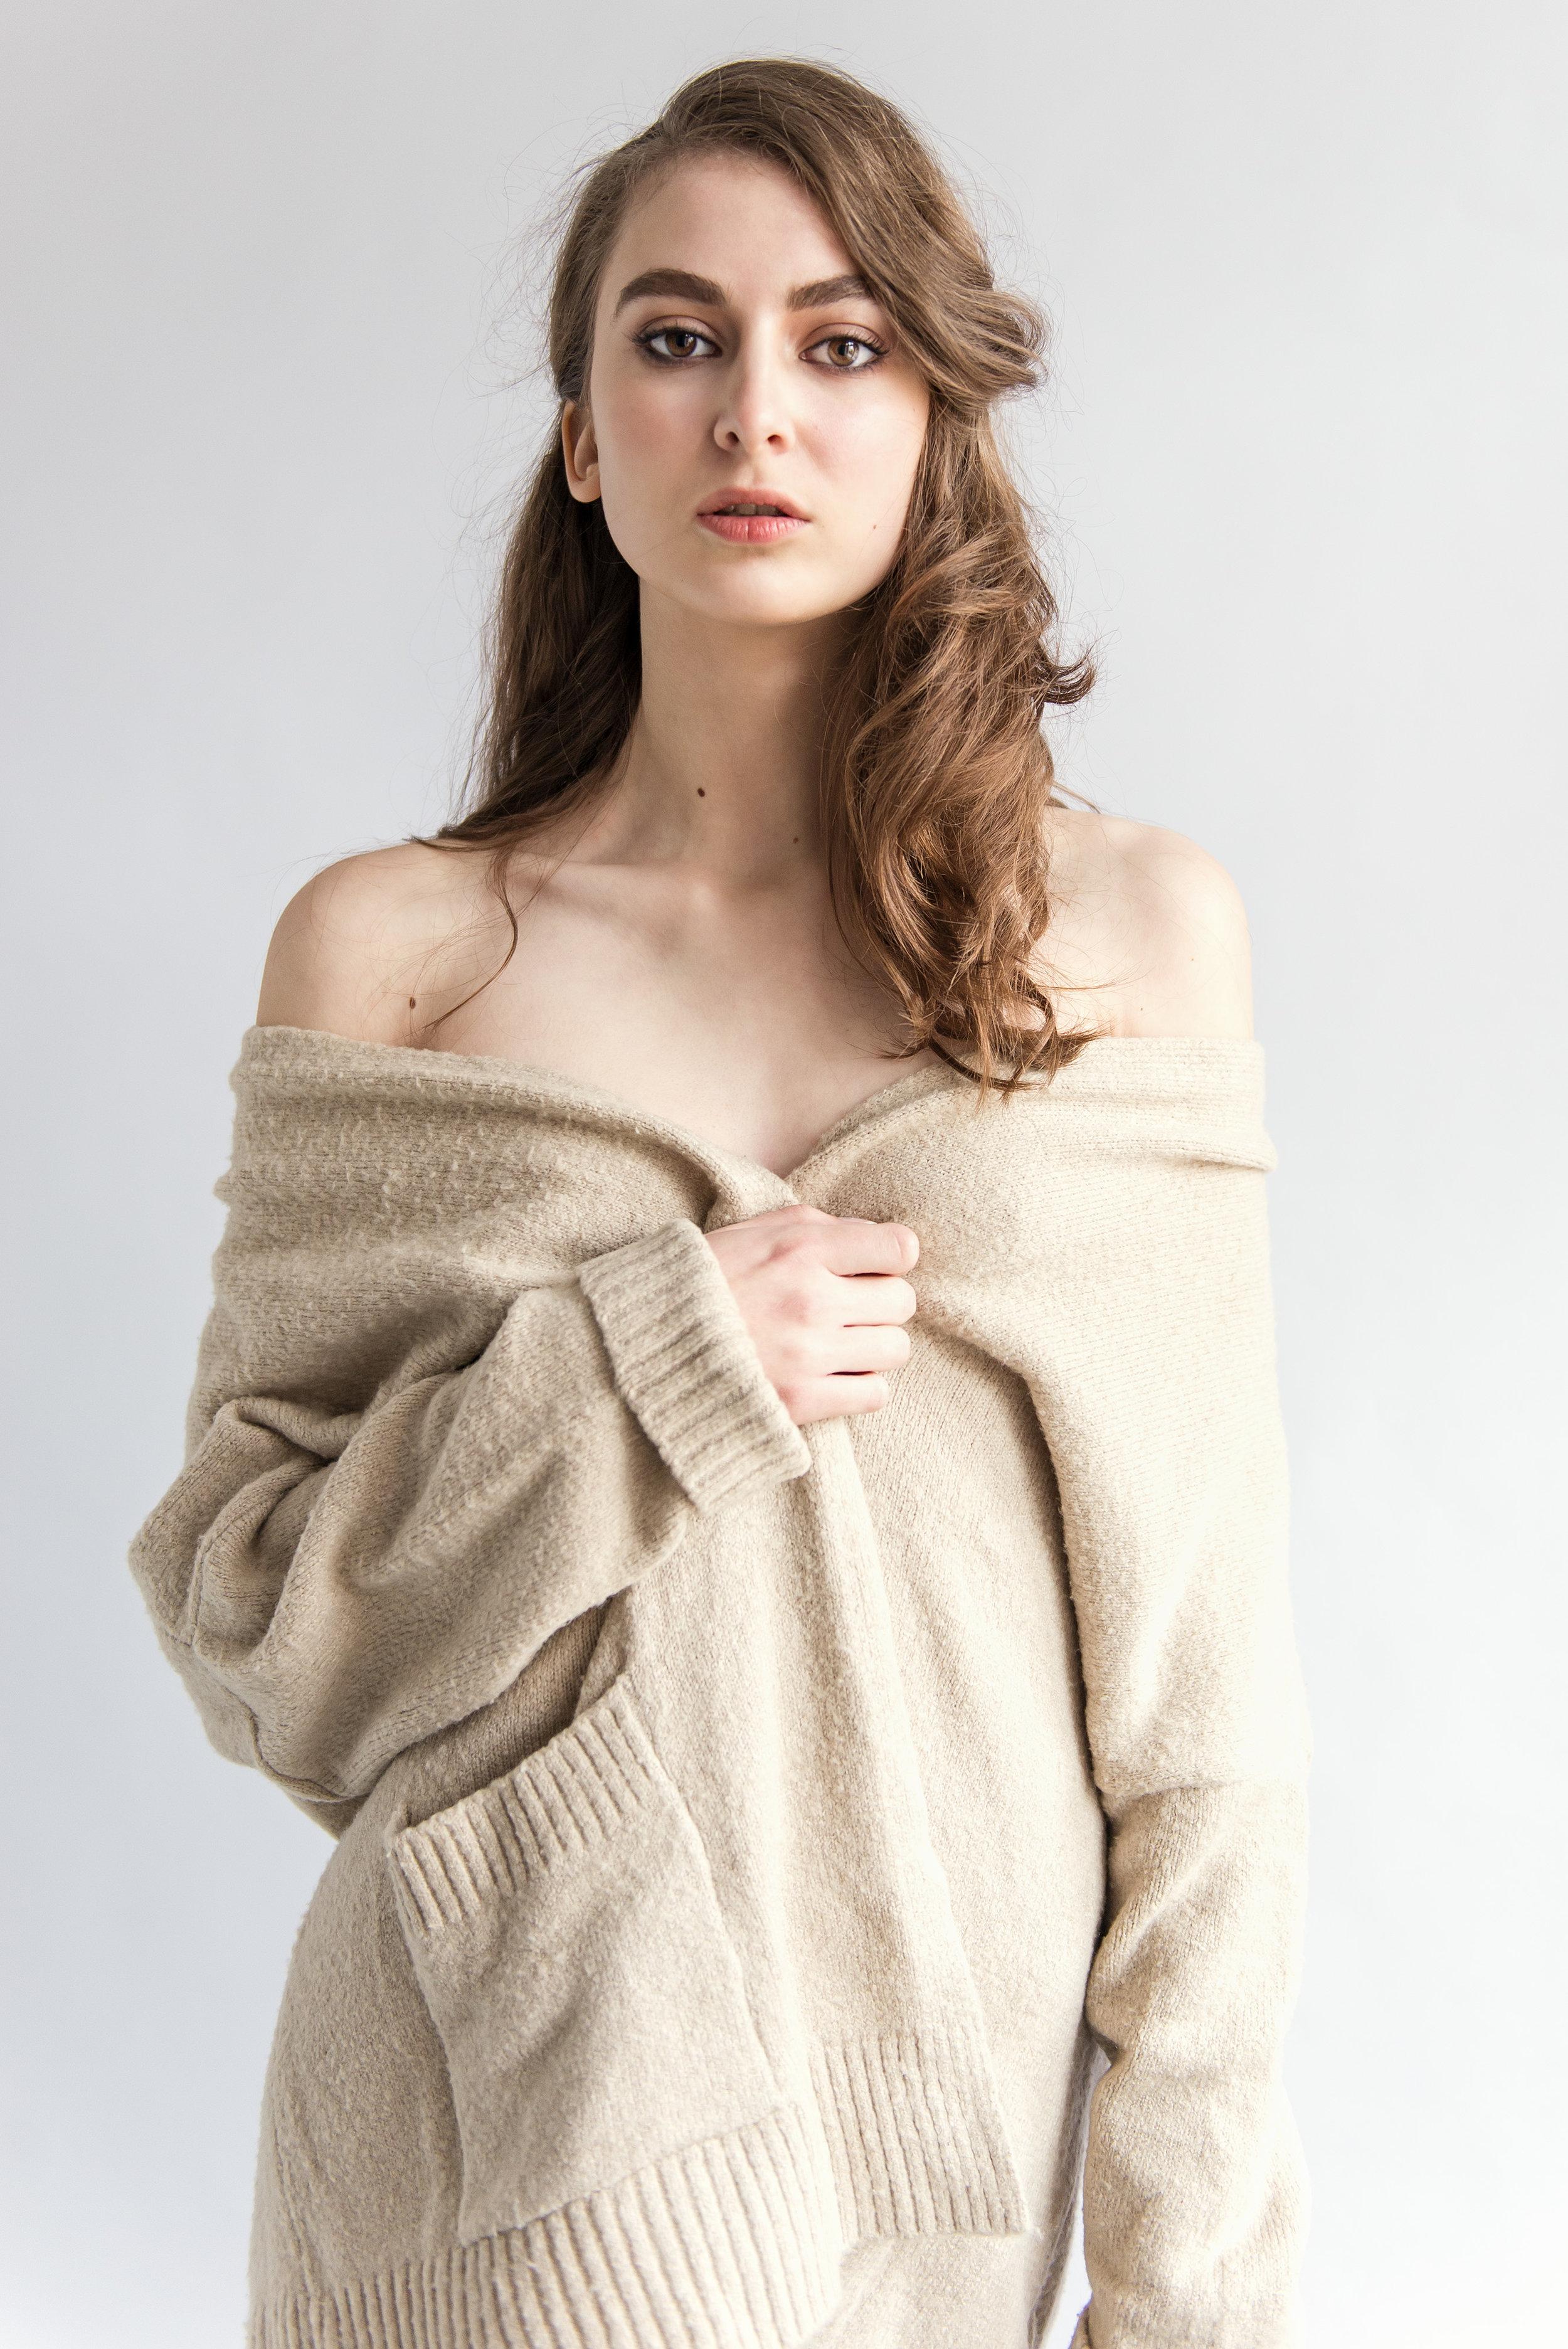 test_Karolina_RAVEN_Models_12_by_Szymon_Ratajczyk.jpg